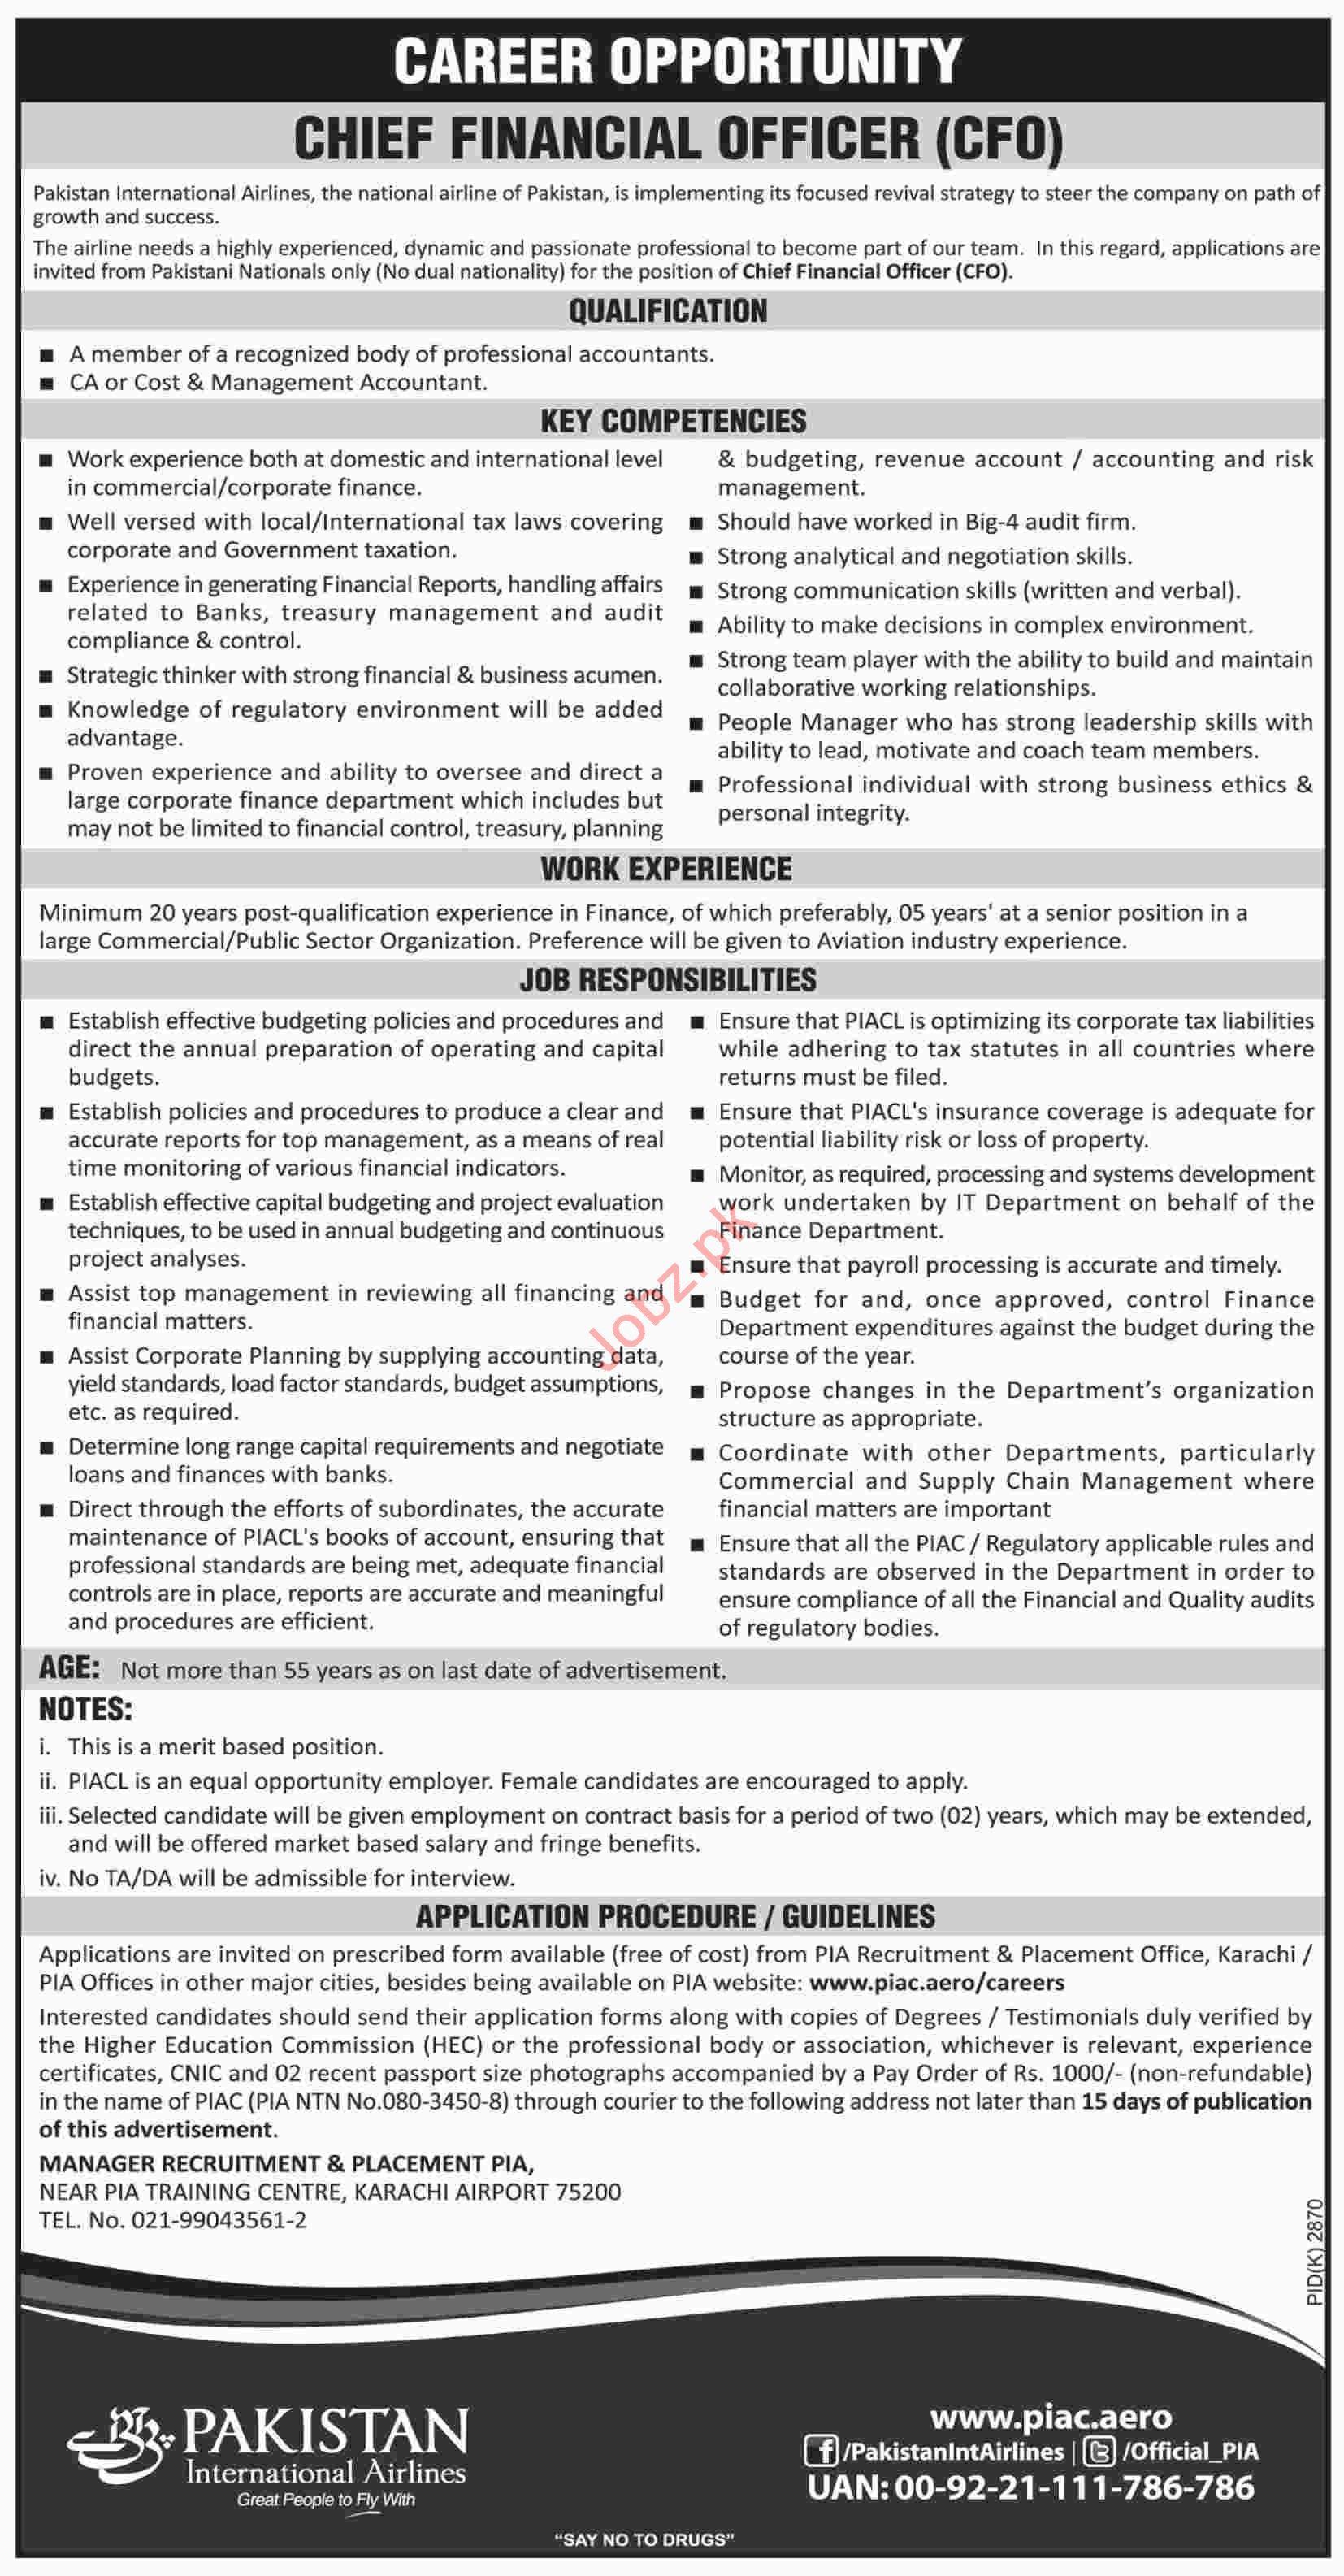 PIA Karachi Jobs 2019 for Chief Financial Officer